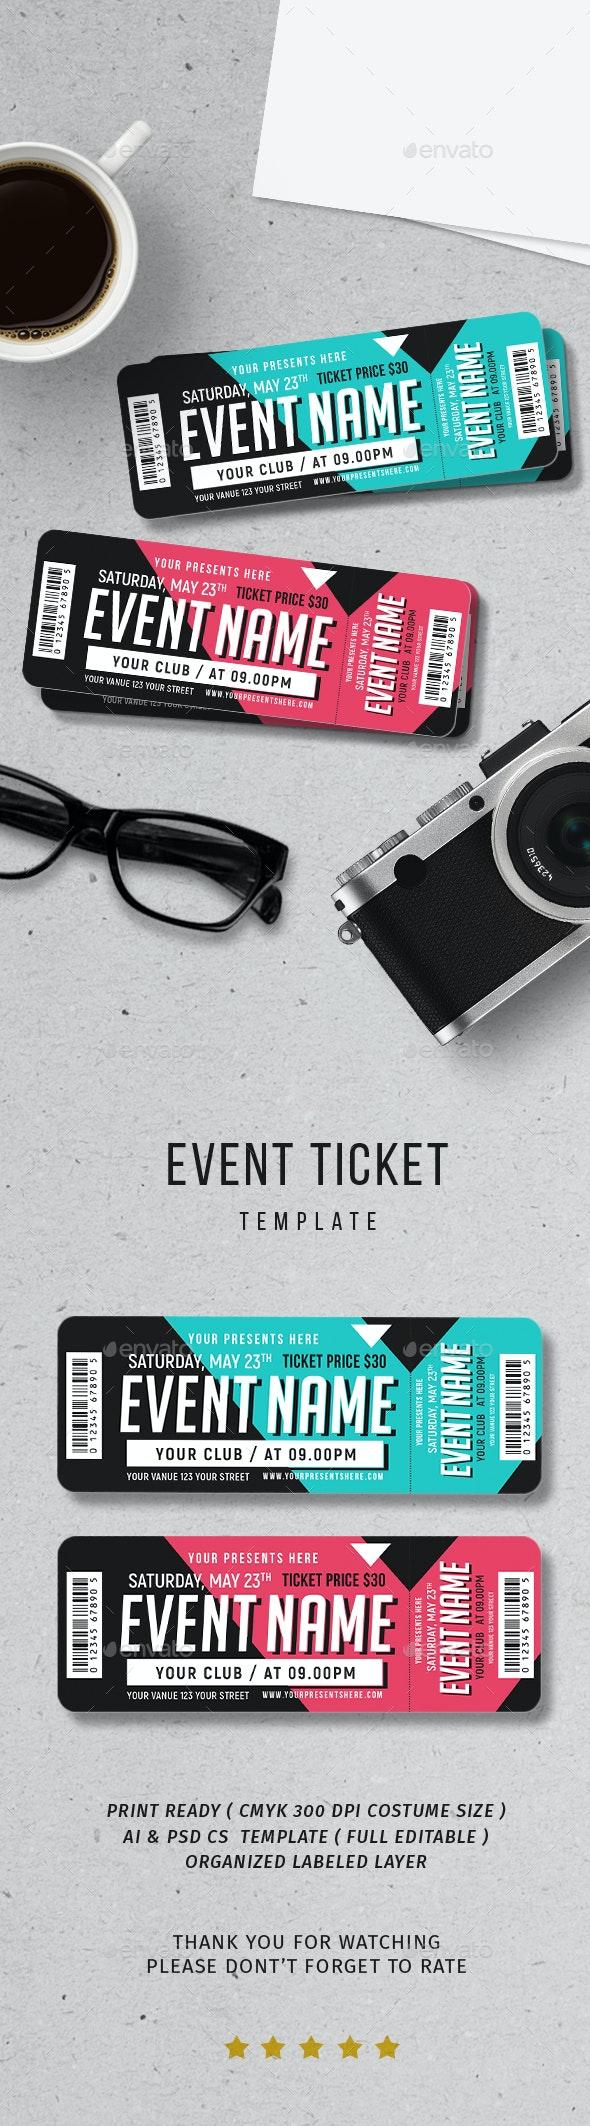 Event Ticket - Print Templates